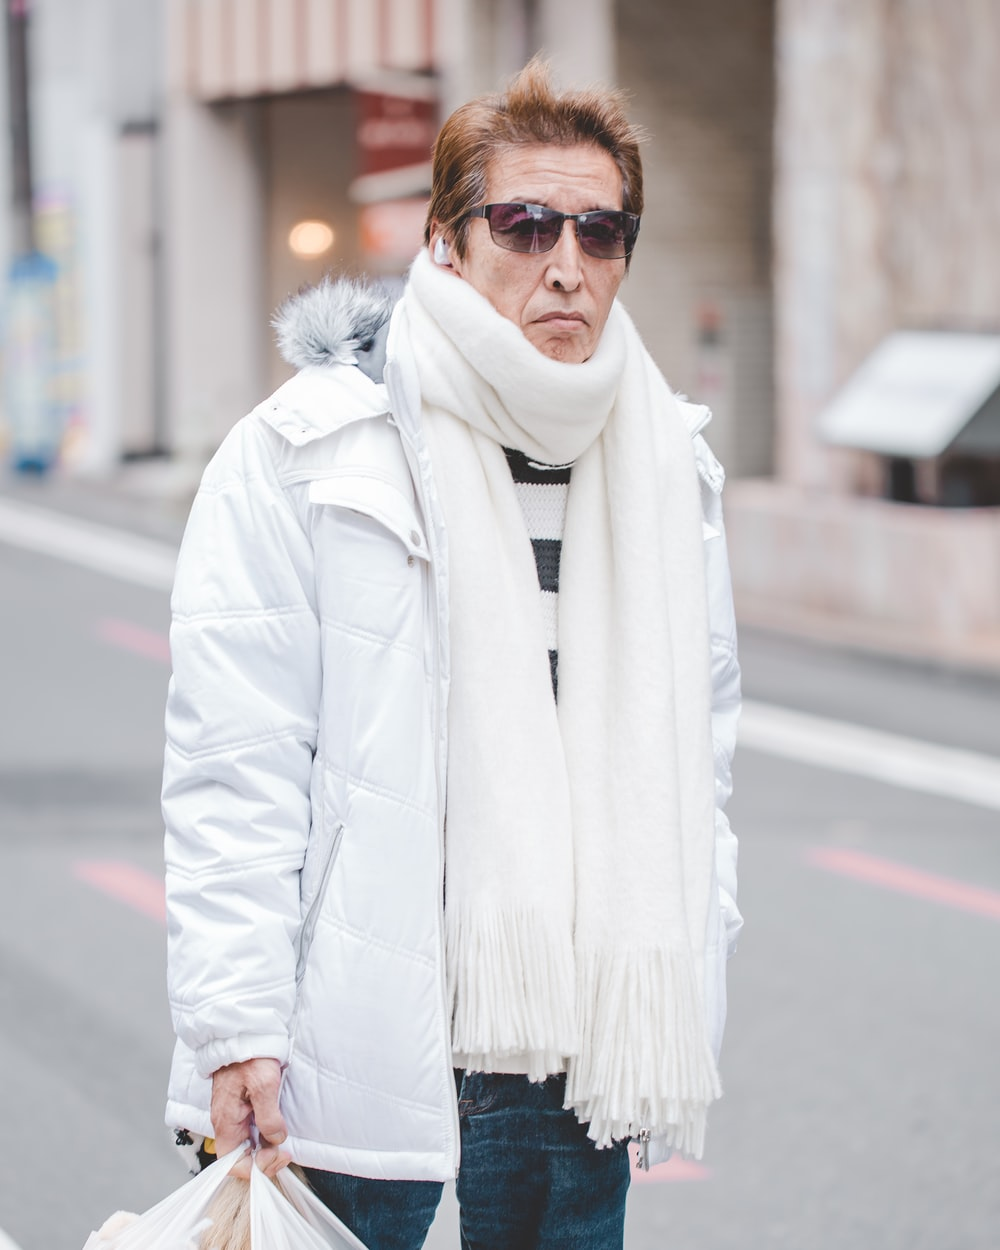 man in white parka jacket and white scarf walking on street at daytime